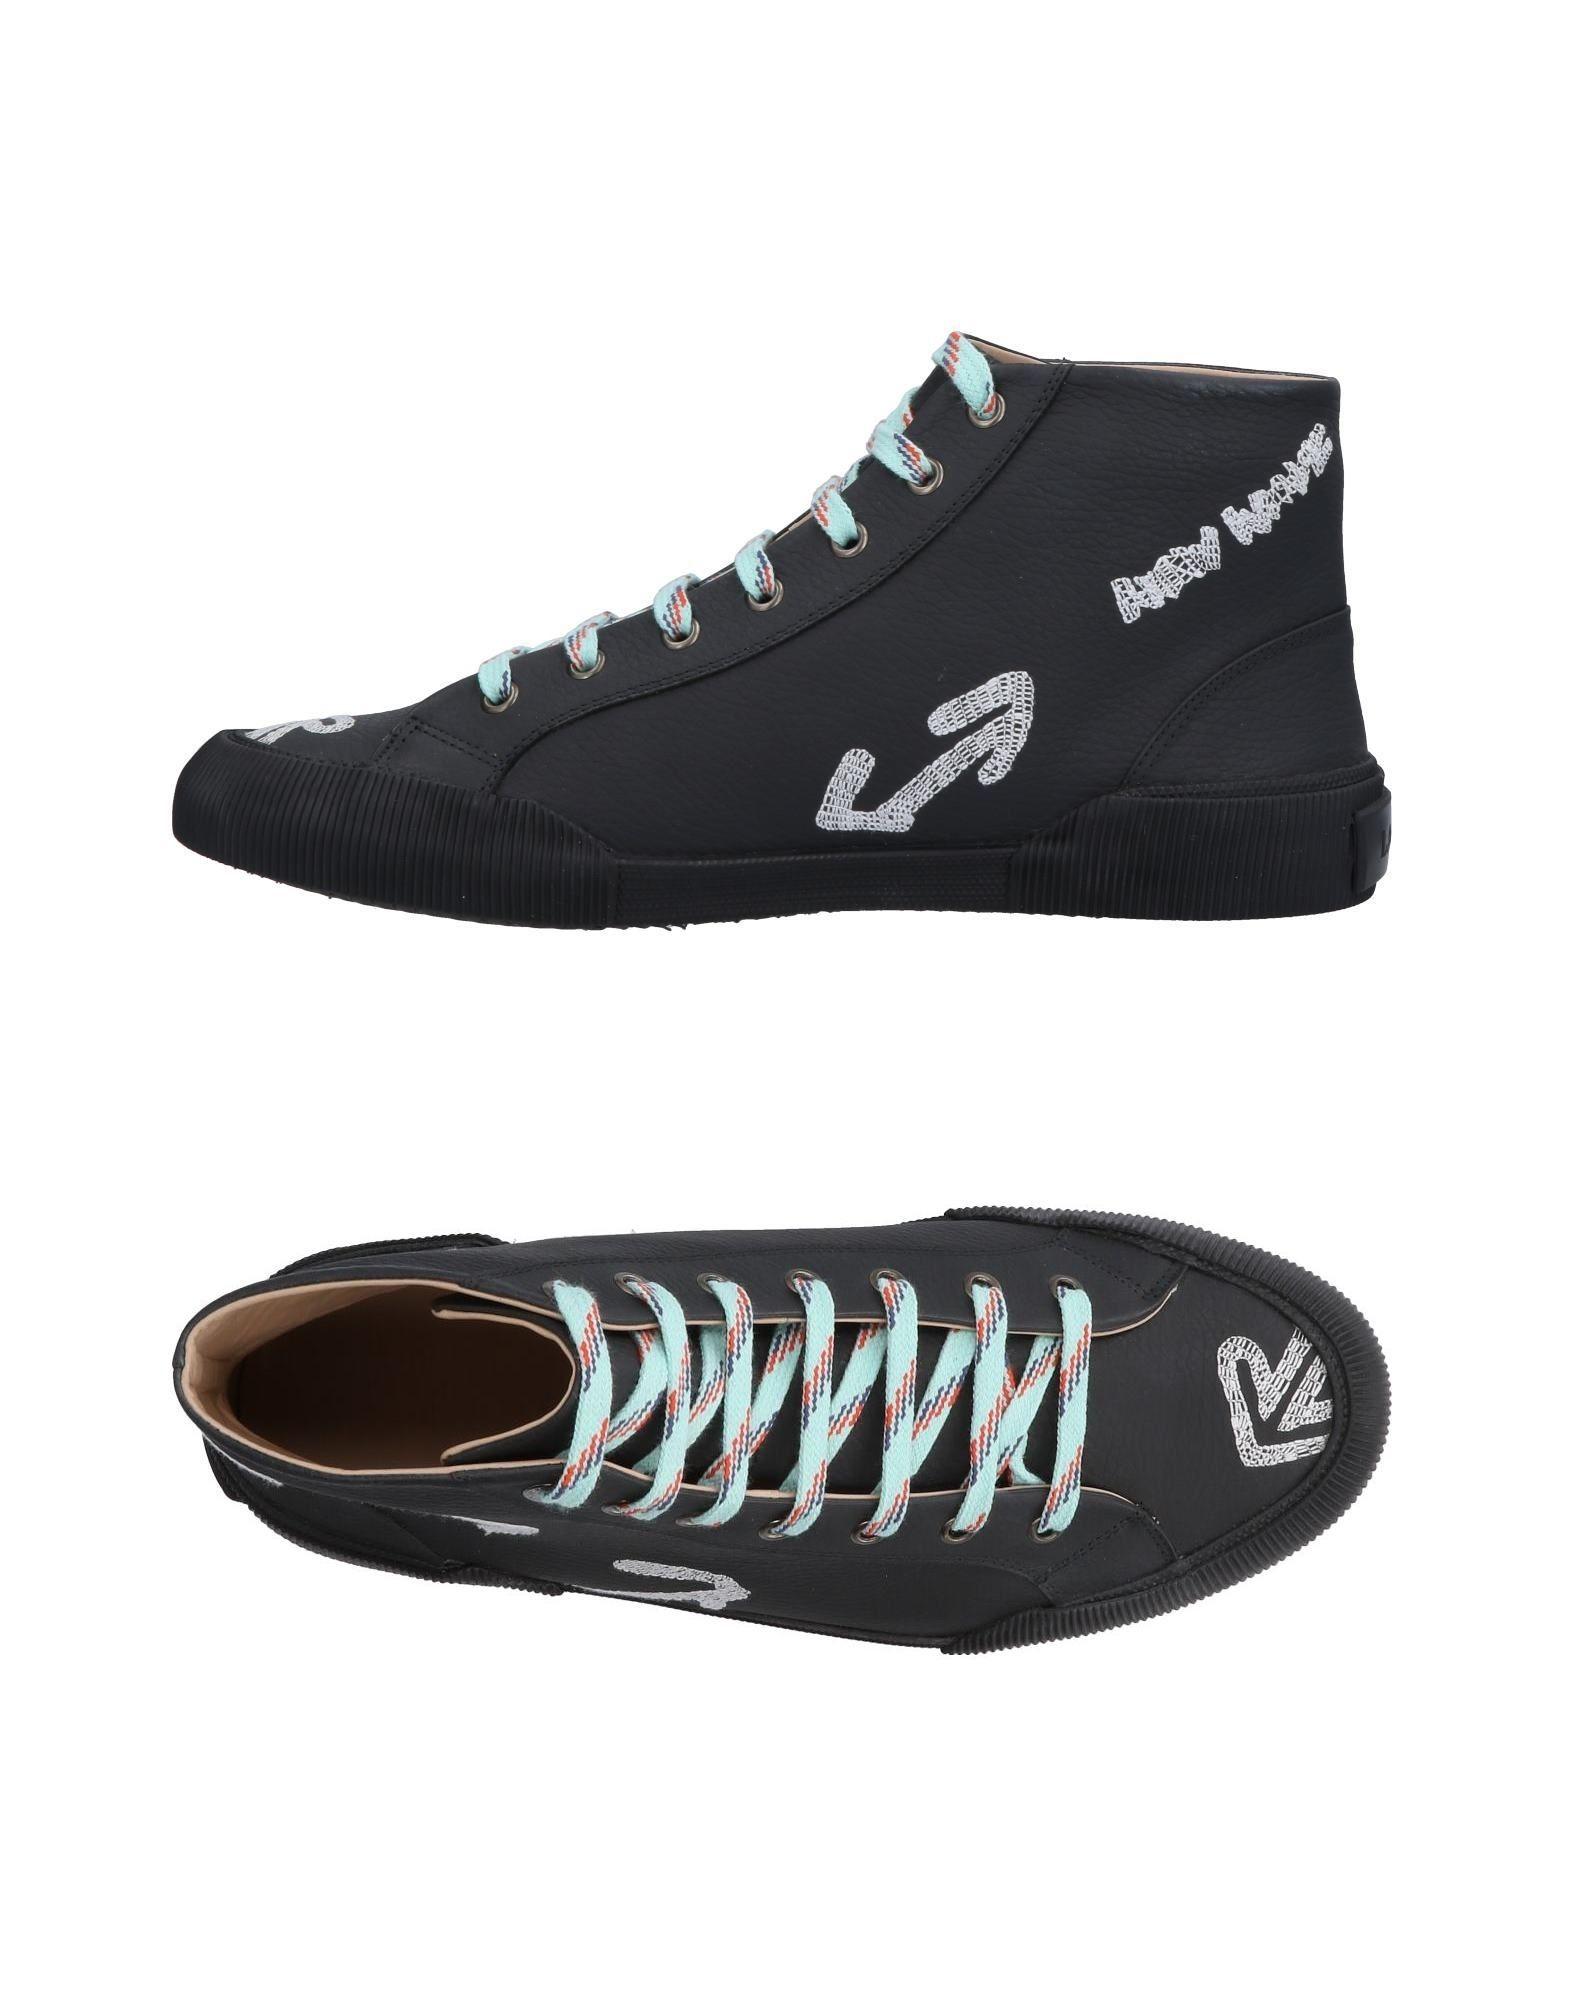 Lanvin Sneakers Herren  11487001AQ Gute Qualität beliebte Schuhe